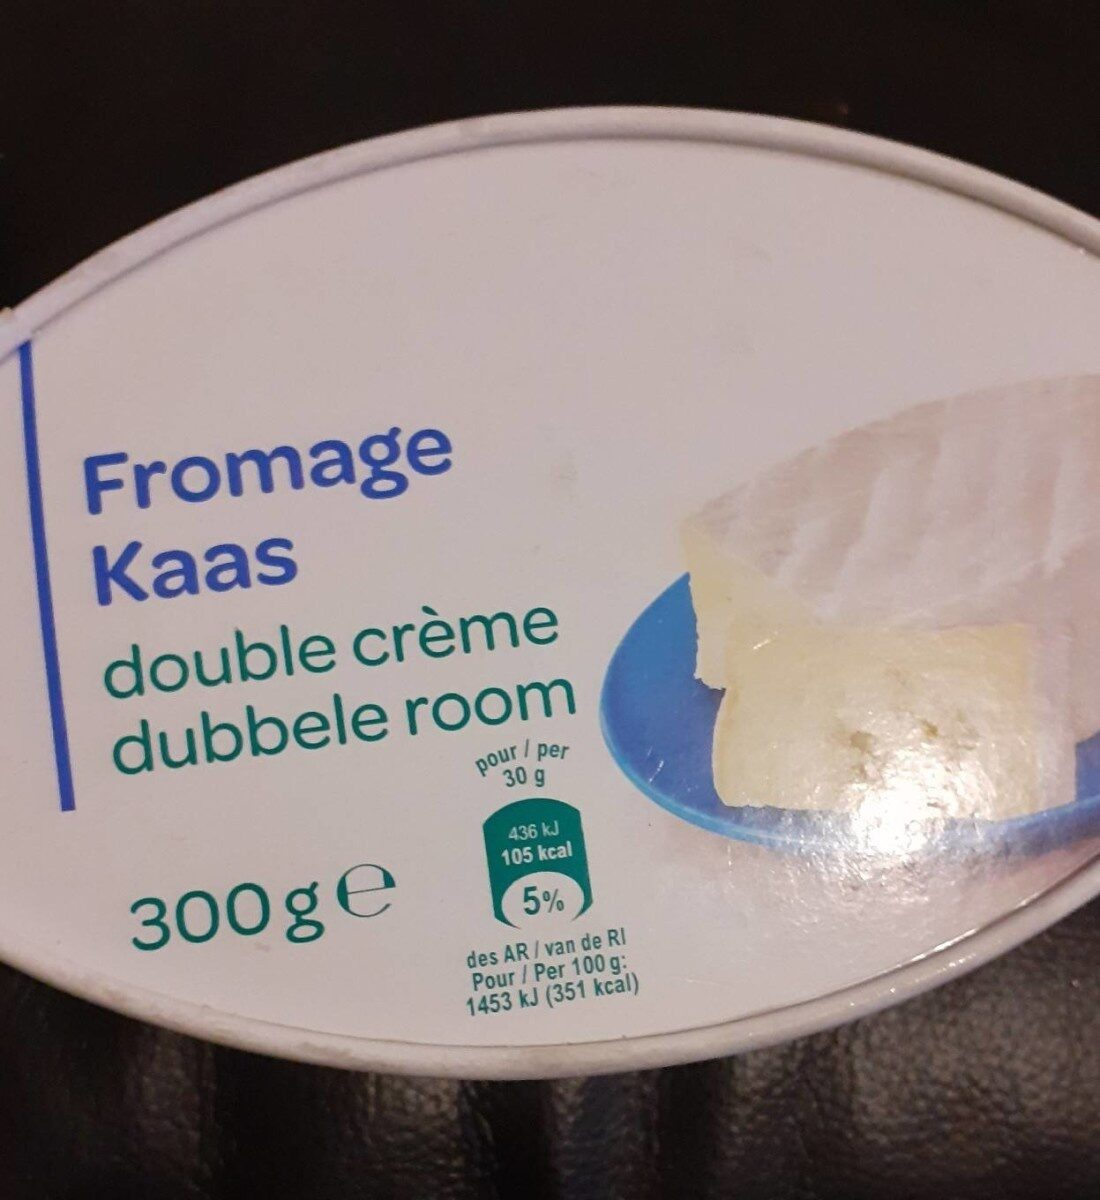 Fromage kasd - Produit - fr